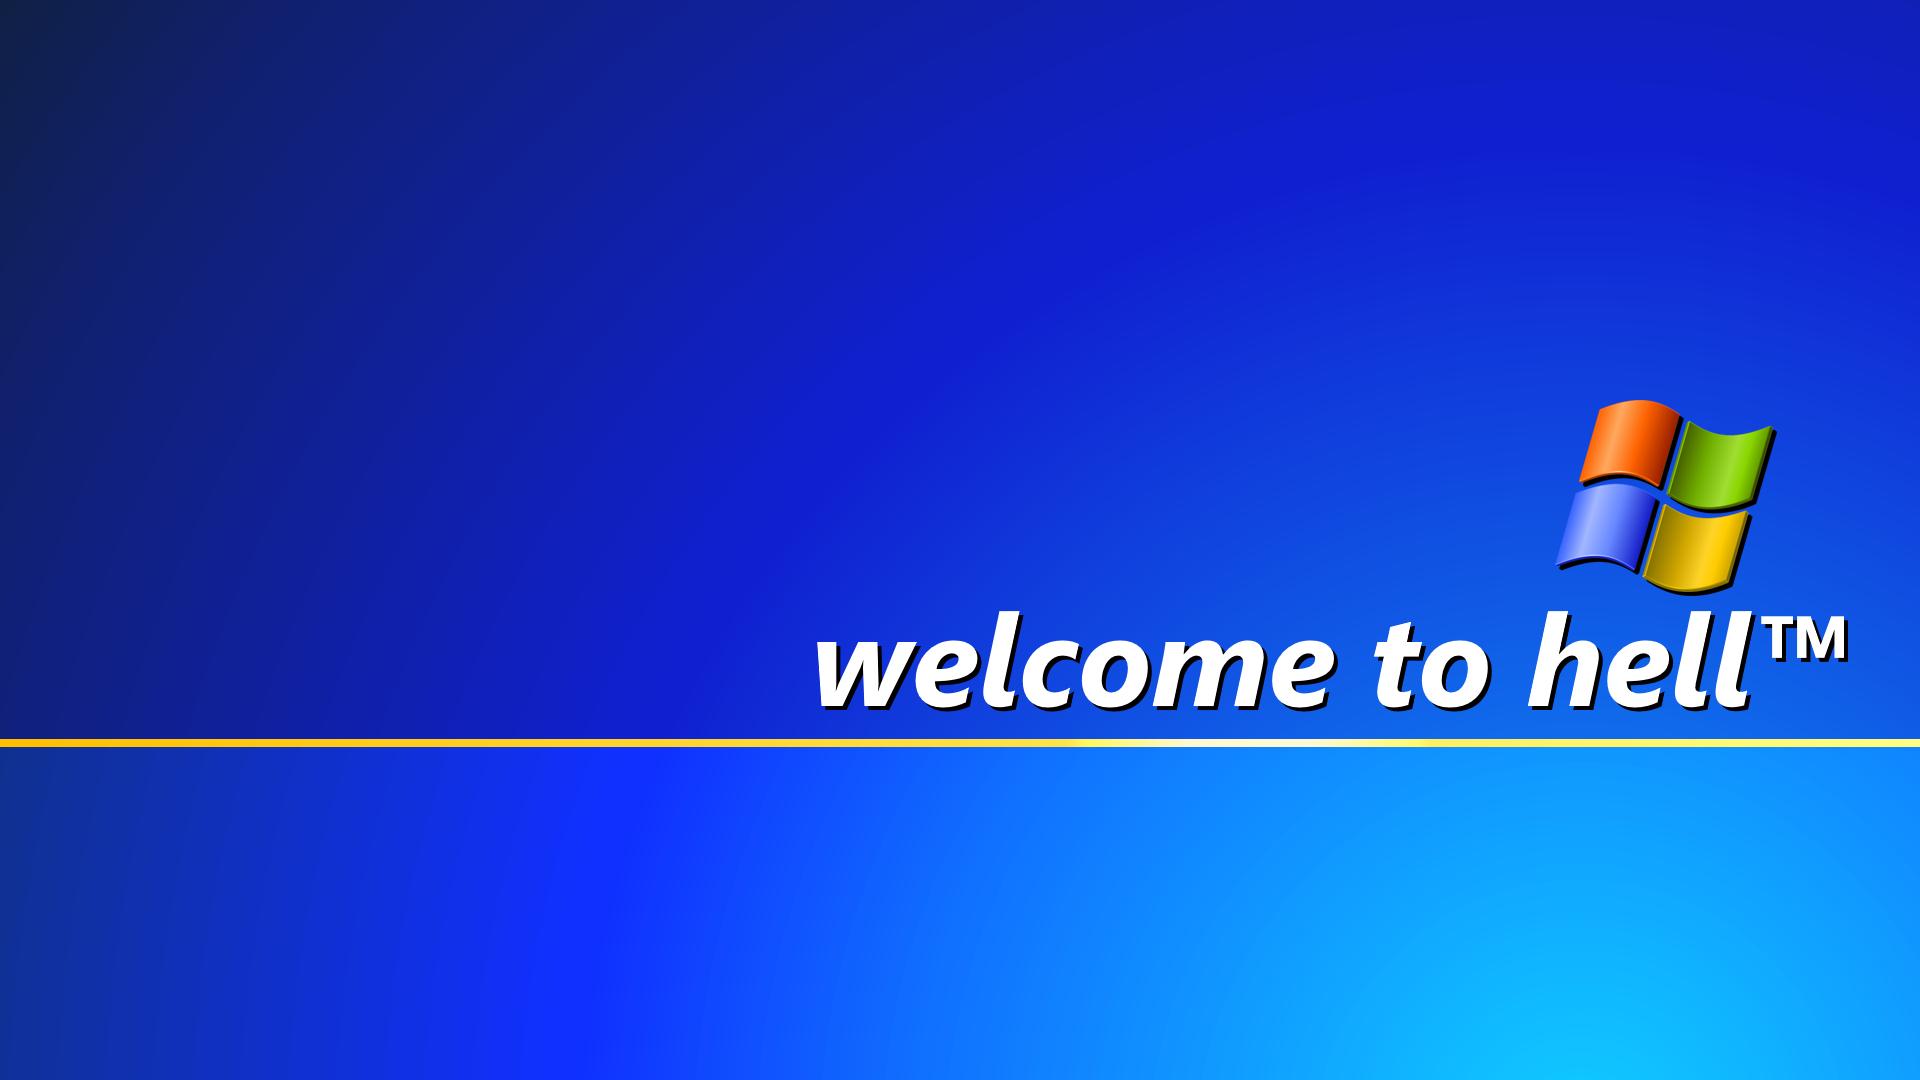 welcometohell2.png.12fdbf563ff2262b64cb3dc740e6f7ad.png